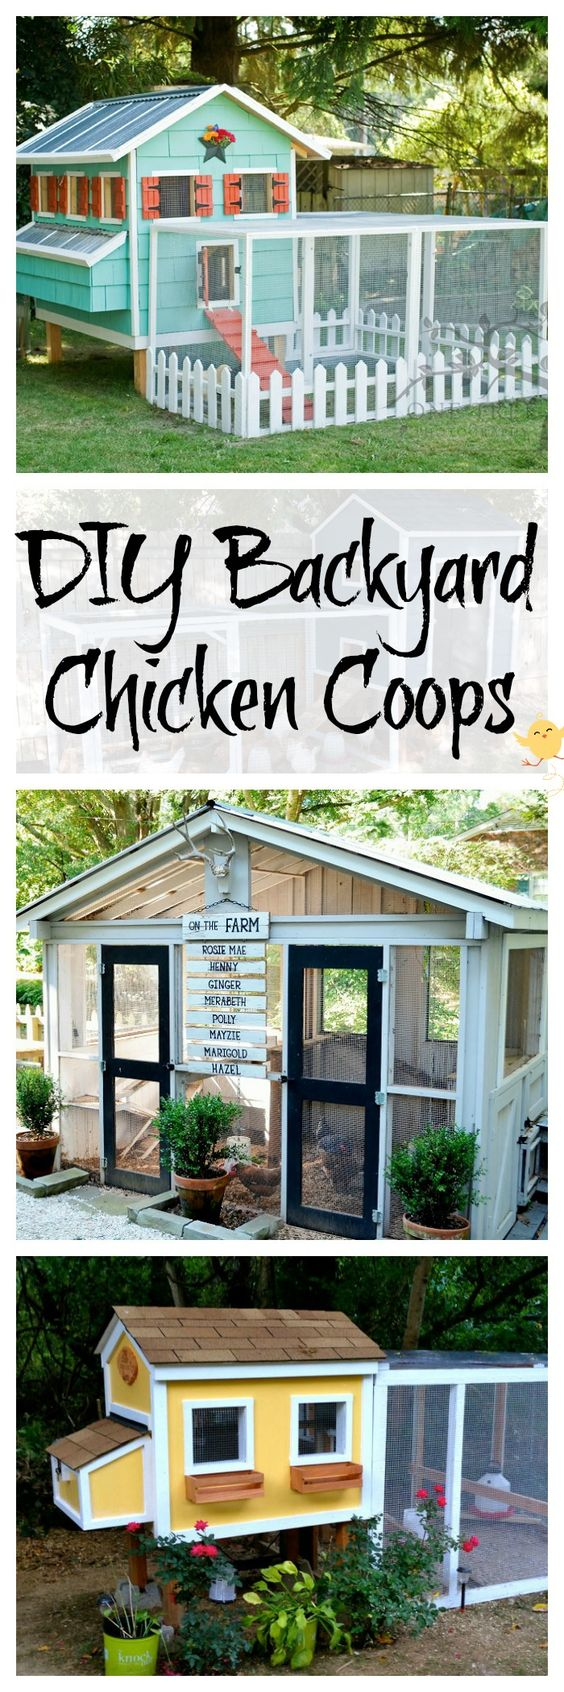 chicken-coop-plans